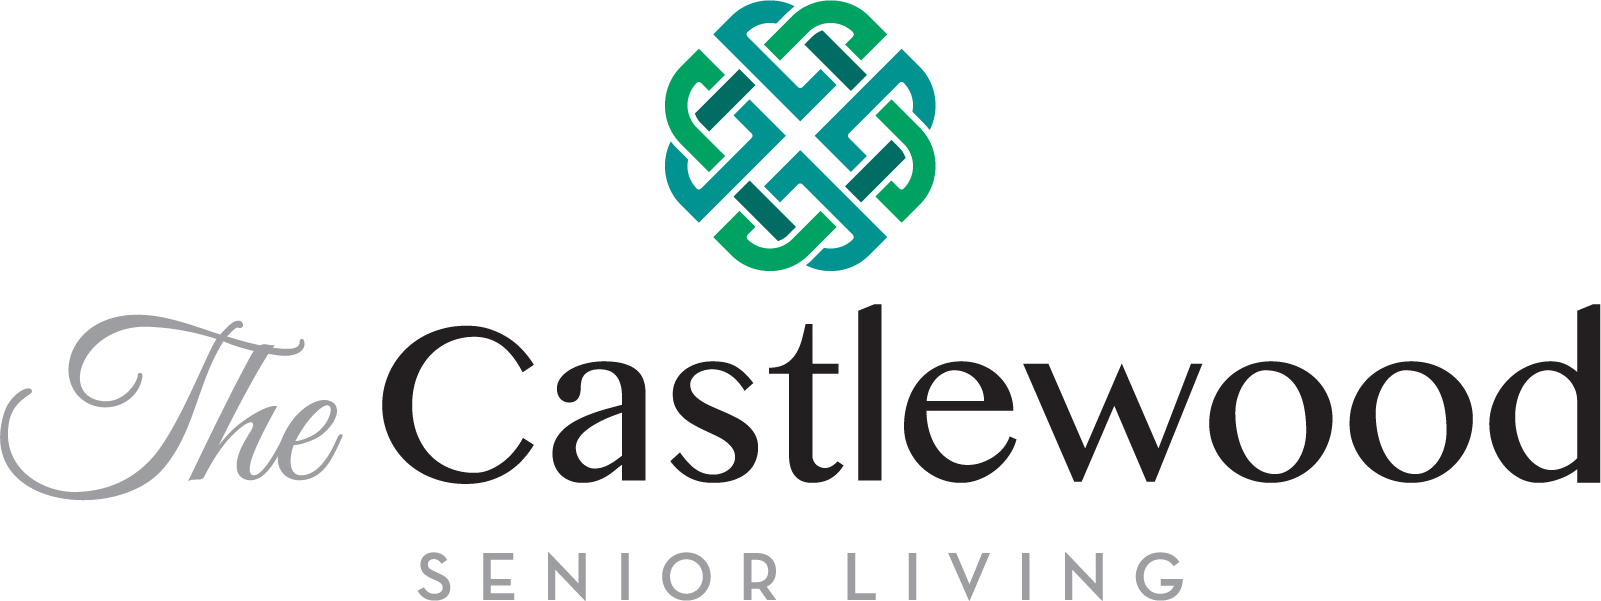 Castlewood Senior Living